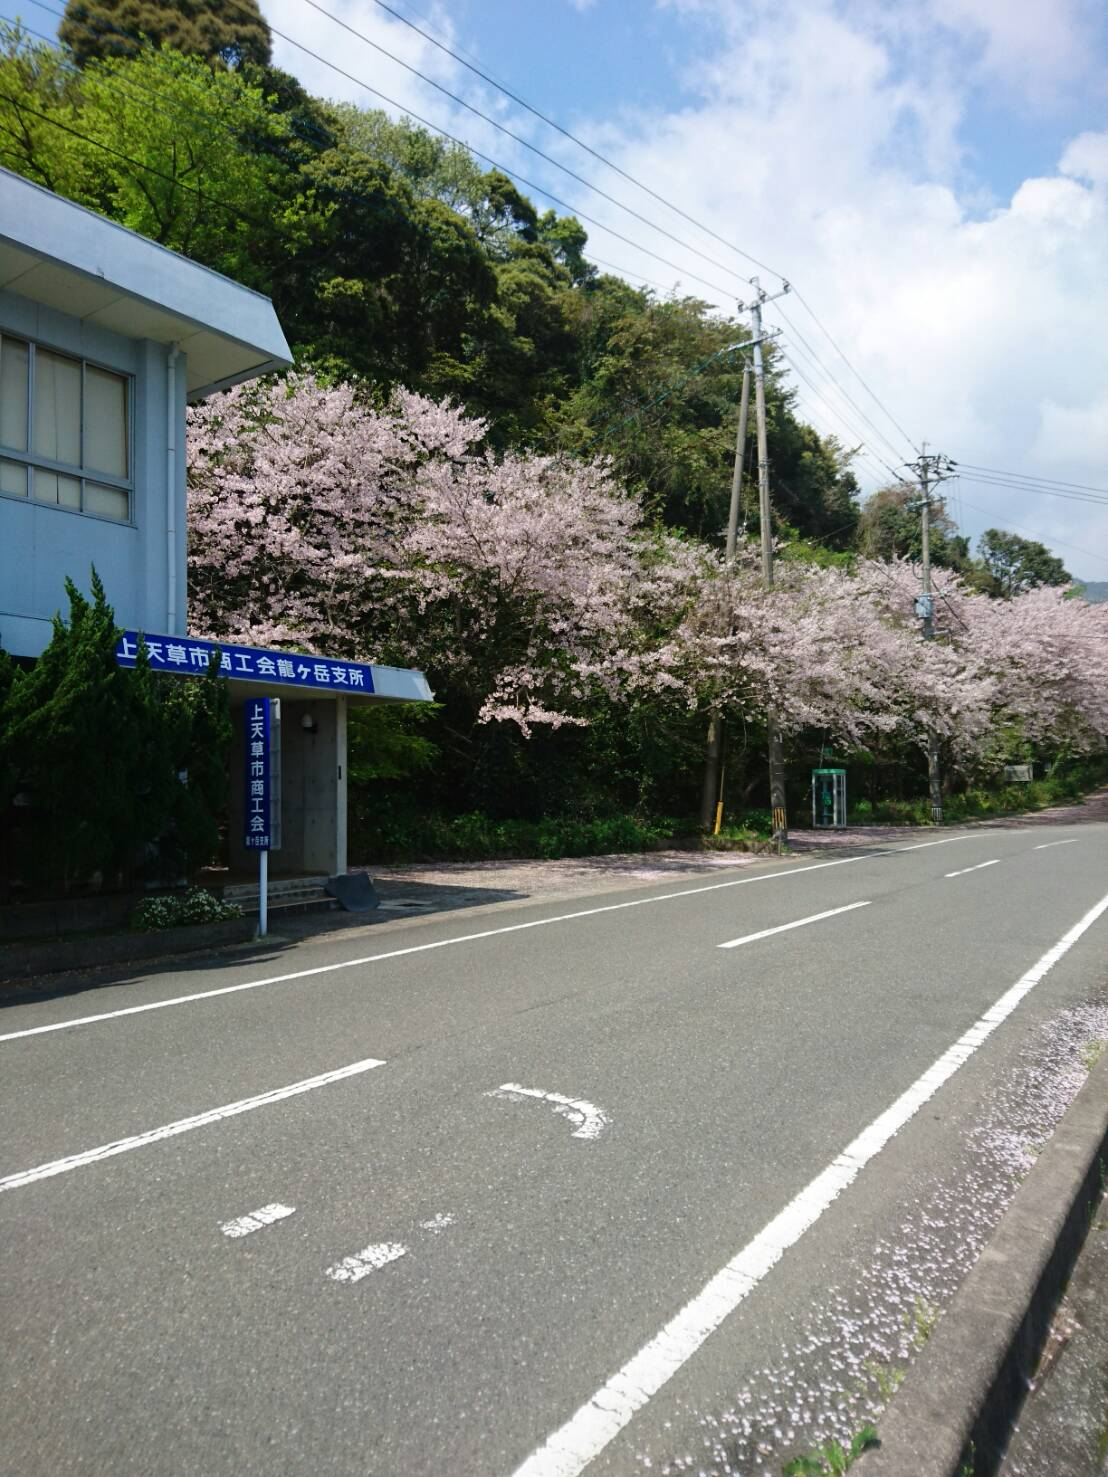 商工会龍ヶ岳支所横の桜並木